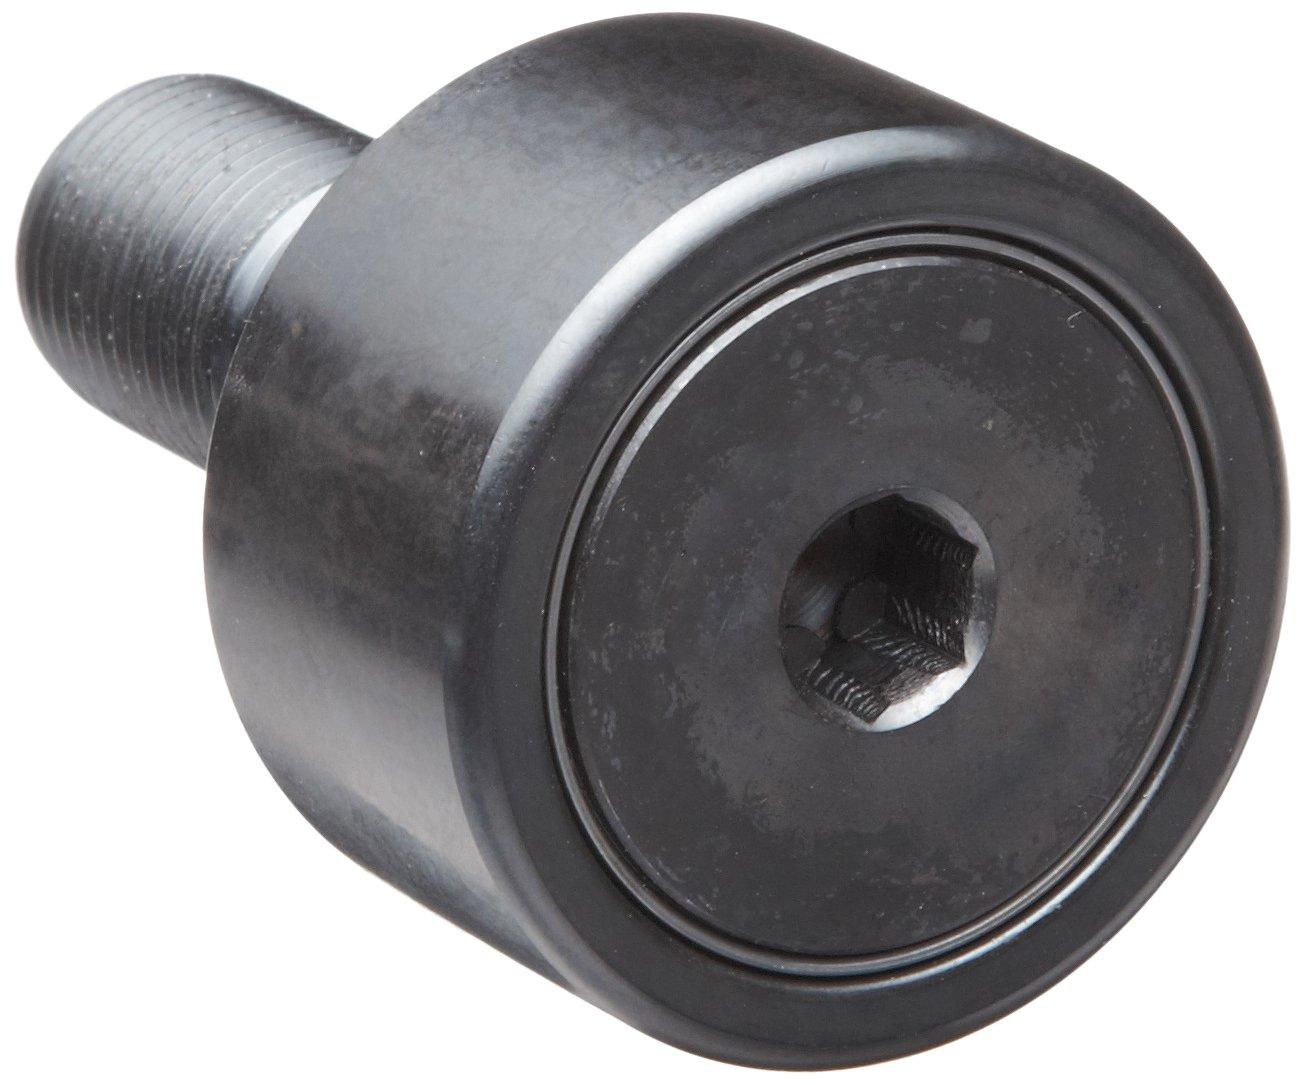 Stud Type 58mm Overall Length 40mm Roller Diameter Metric Standard Unsealed 18mm Stud Diameter 20mm Roller Width INA NUKR40 Cam Follower Steel 36.5mm Stud Length